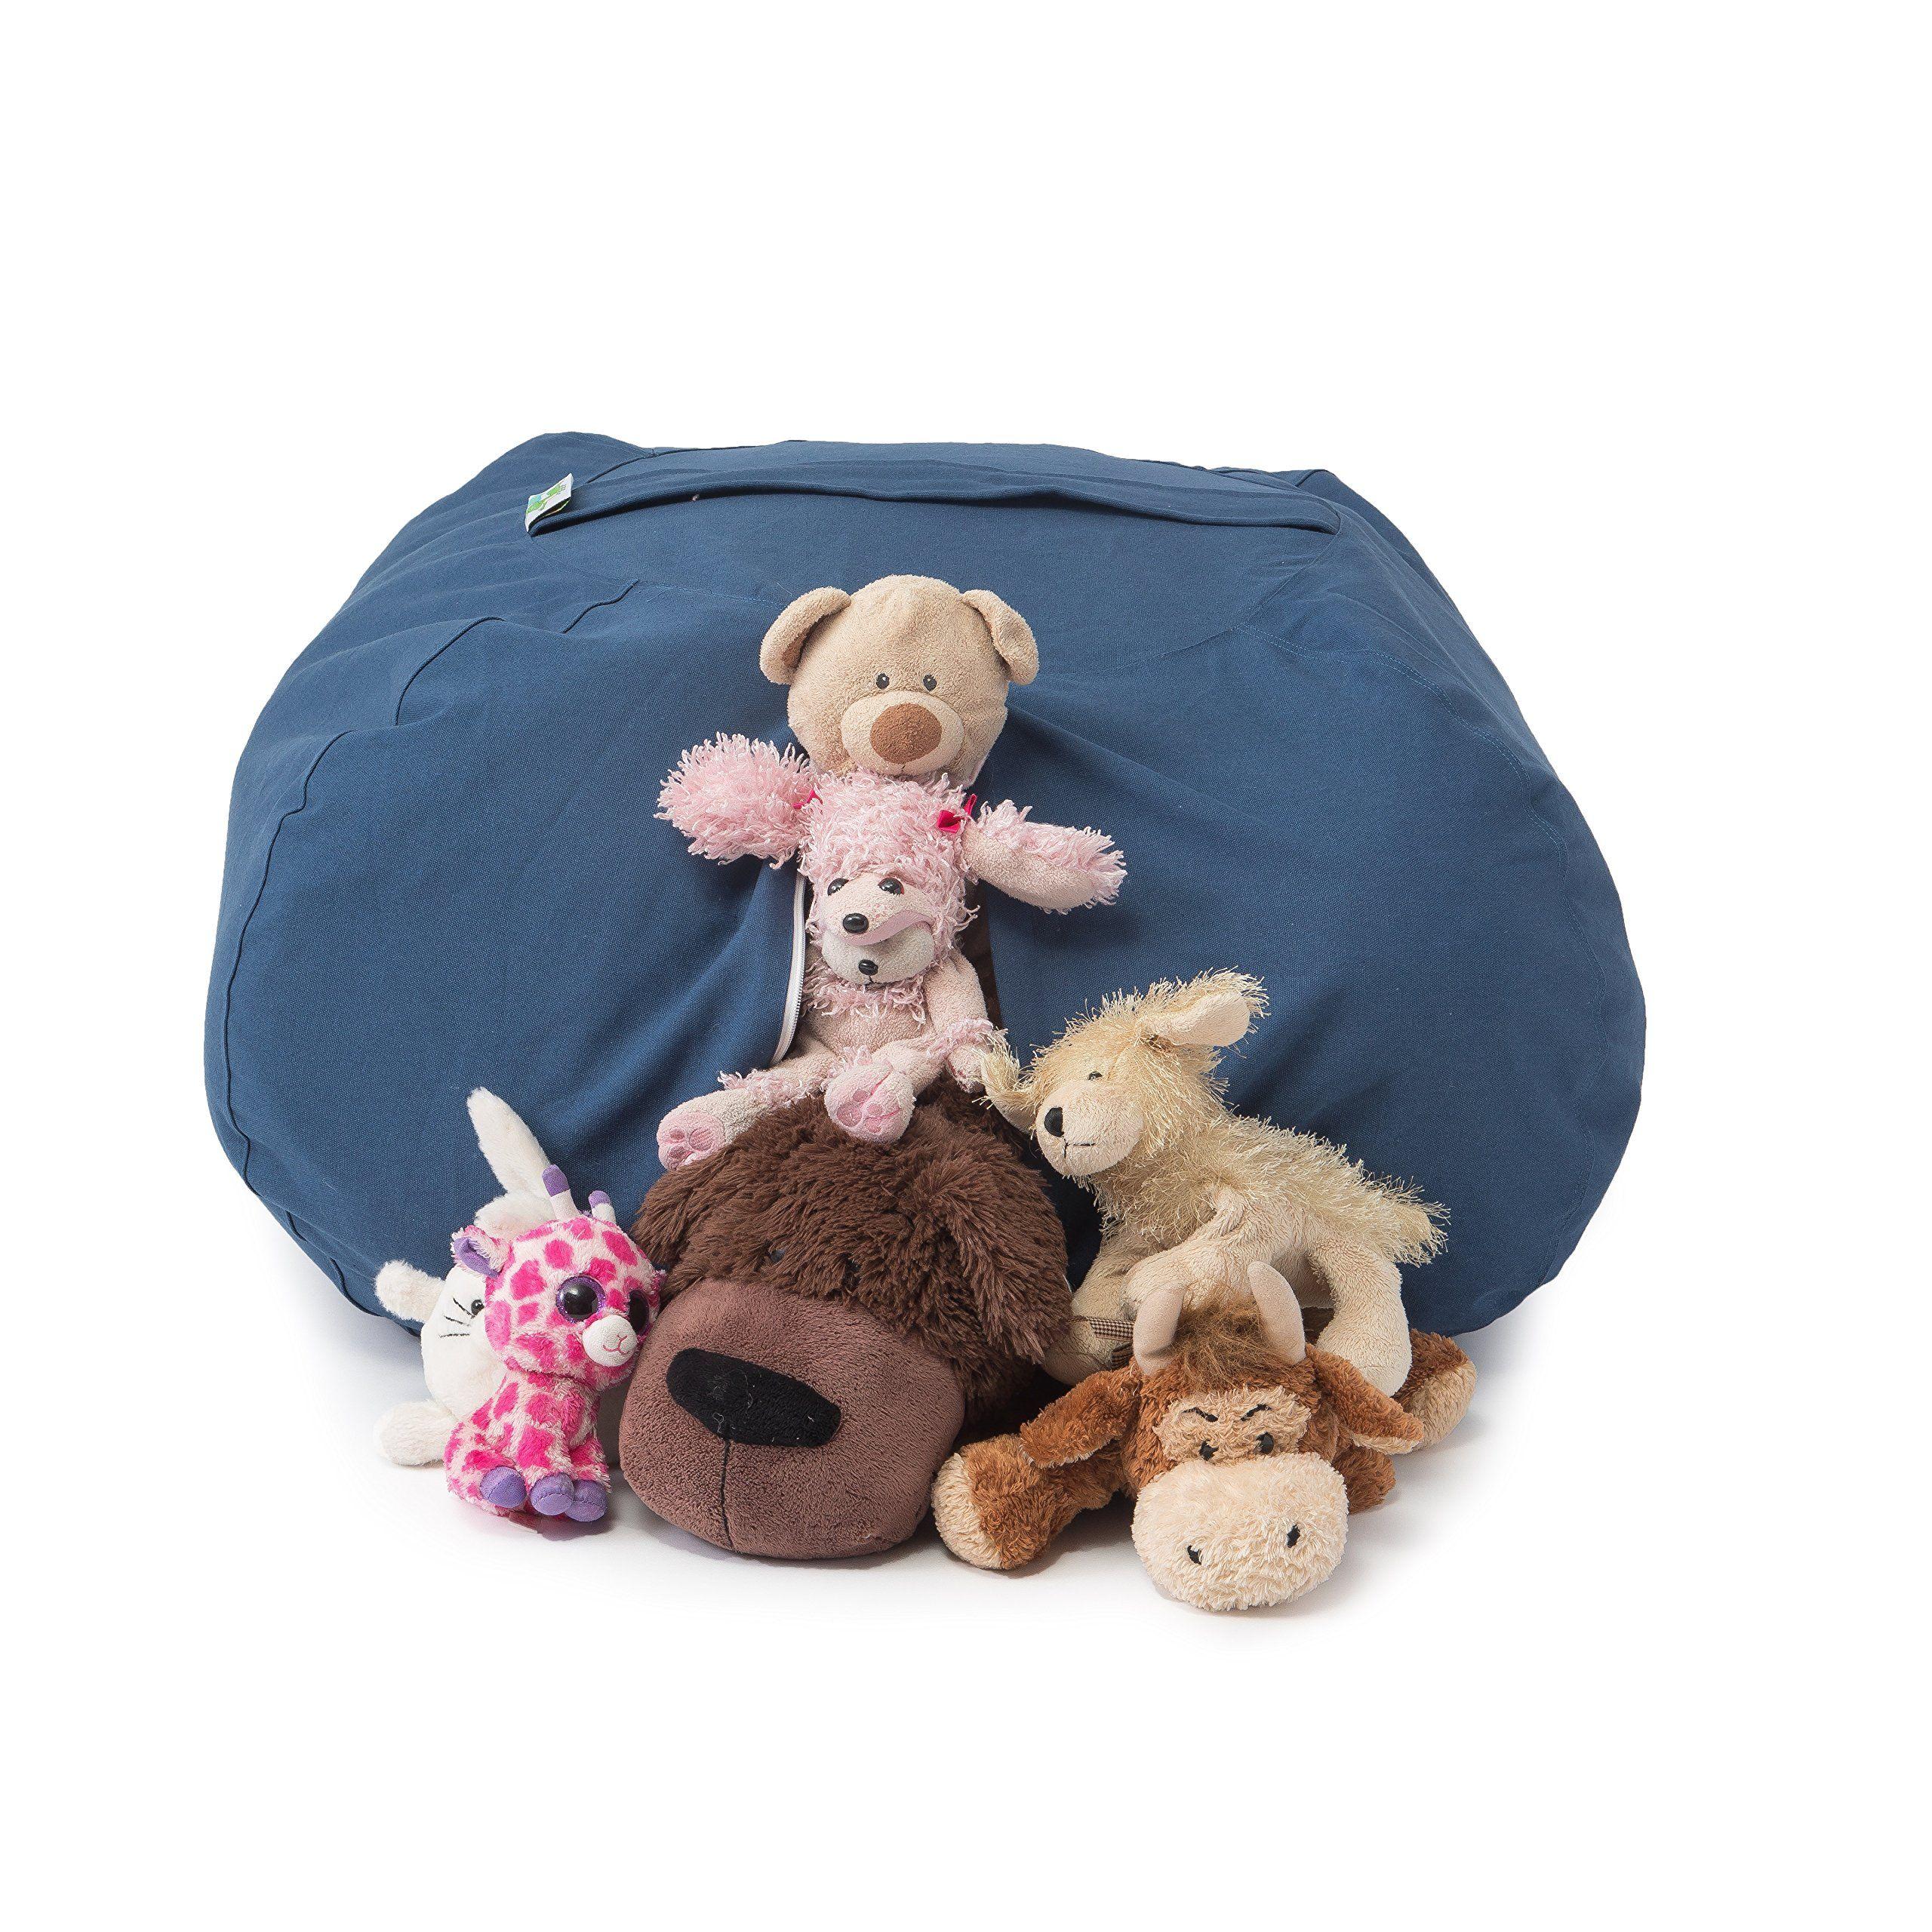 Best stuffed animal storage bean bag chair premium cotton